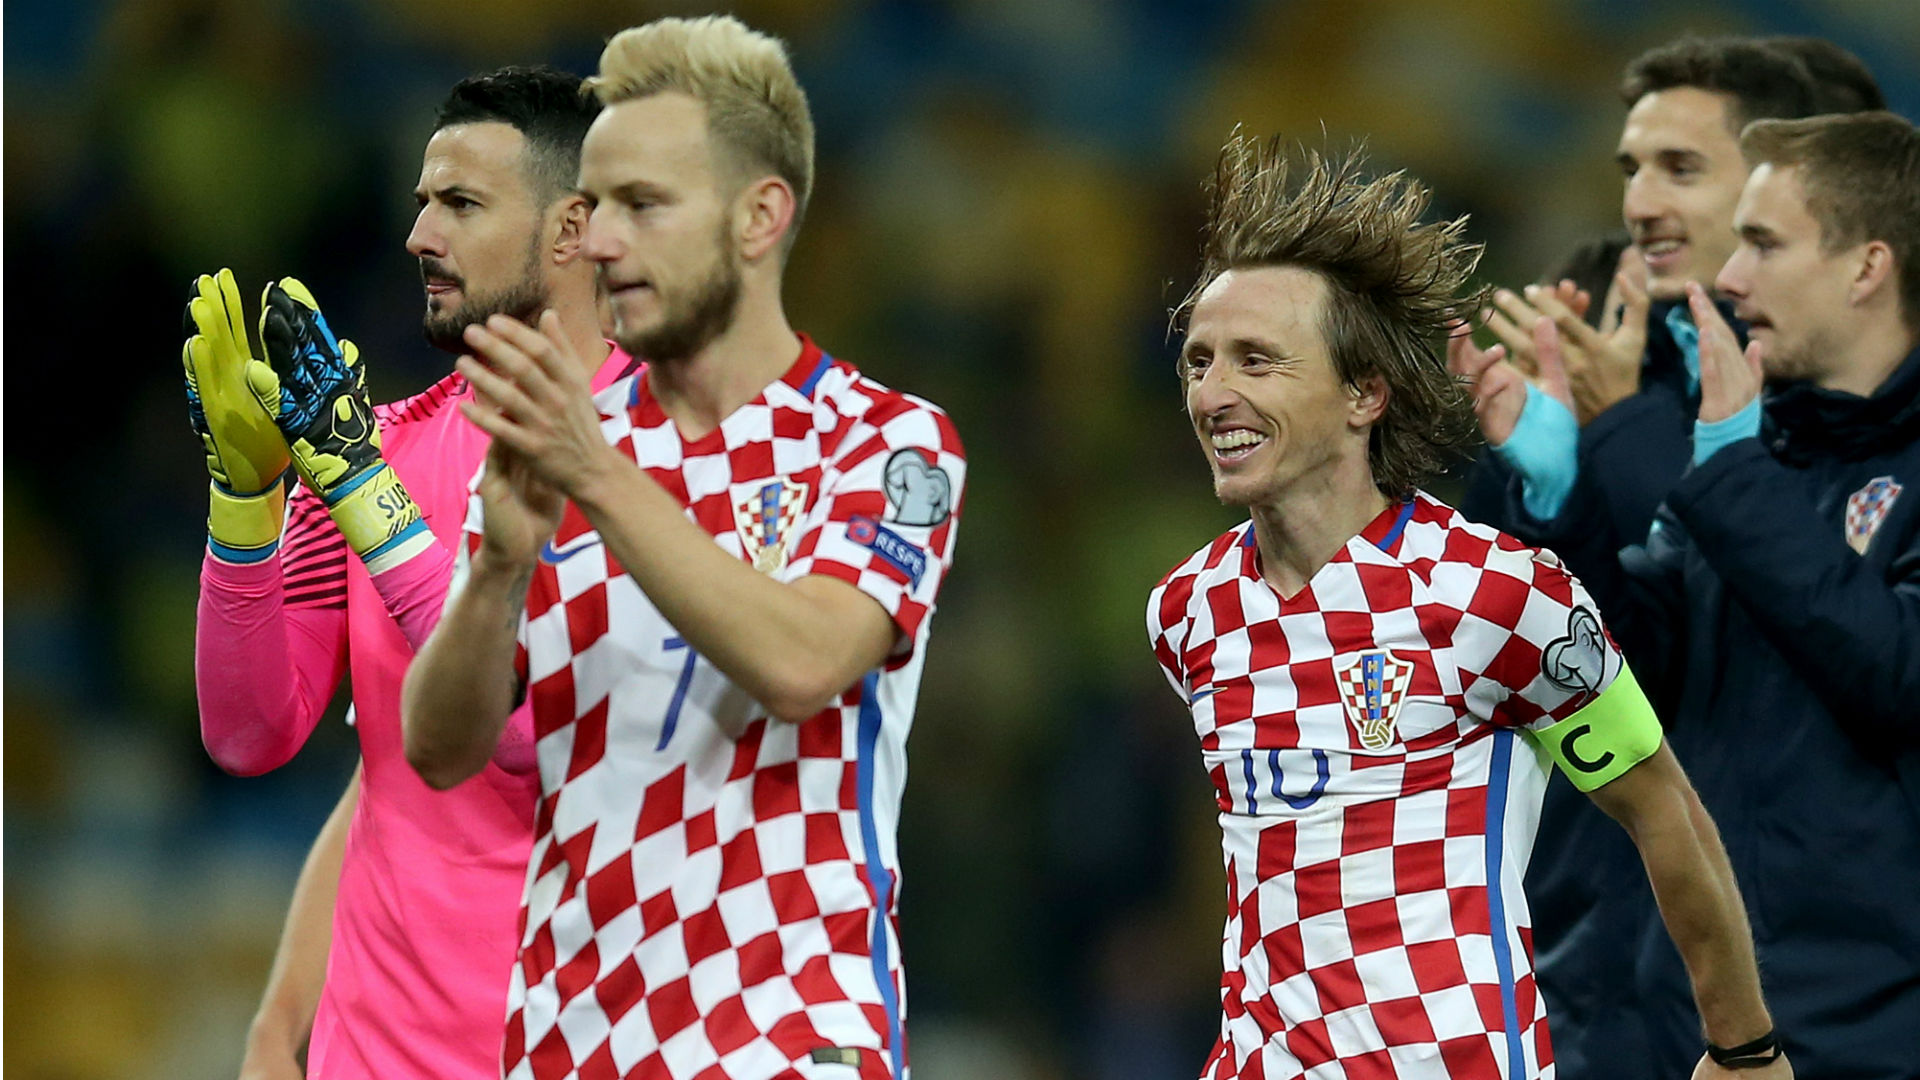 Eslovaquia no alcanza repechaje para Mundial 2018